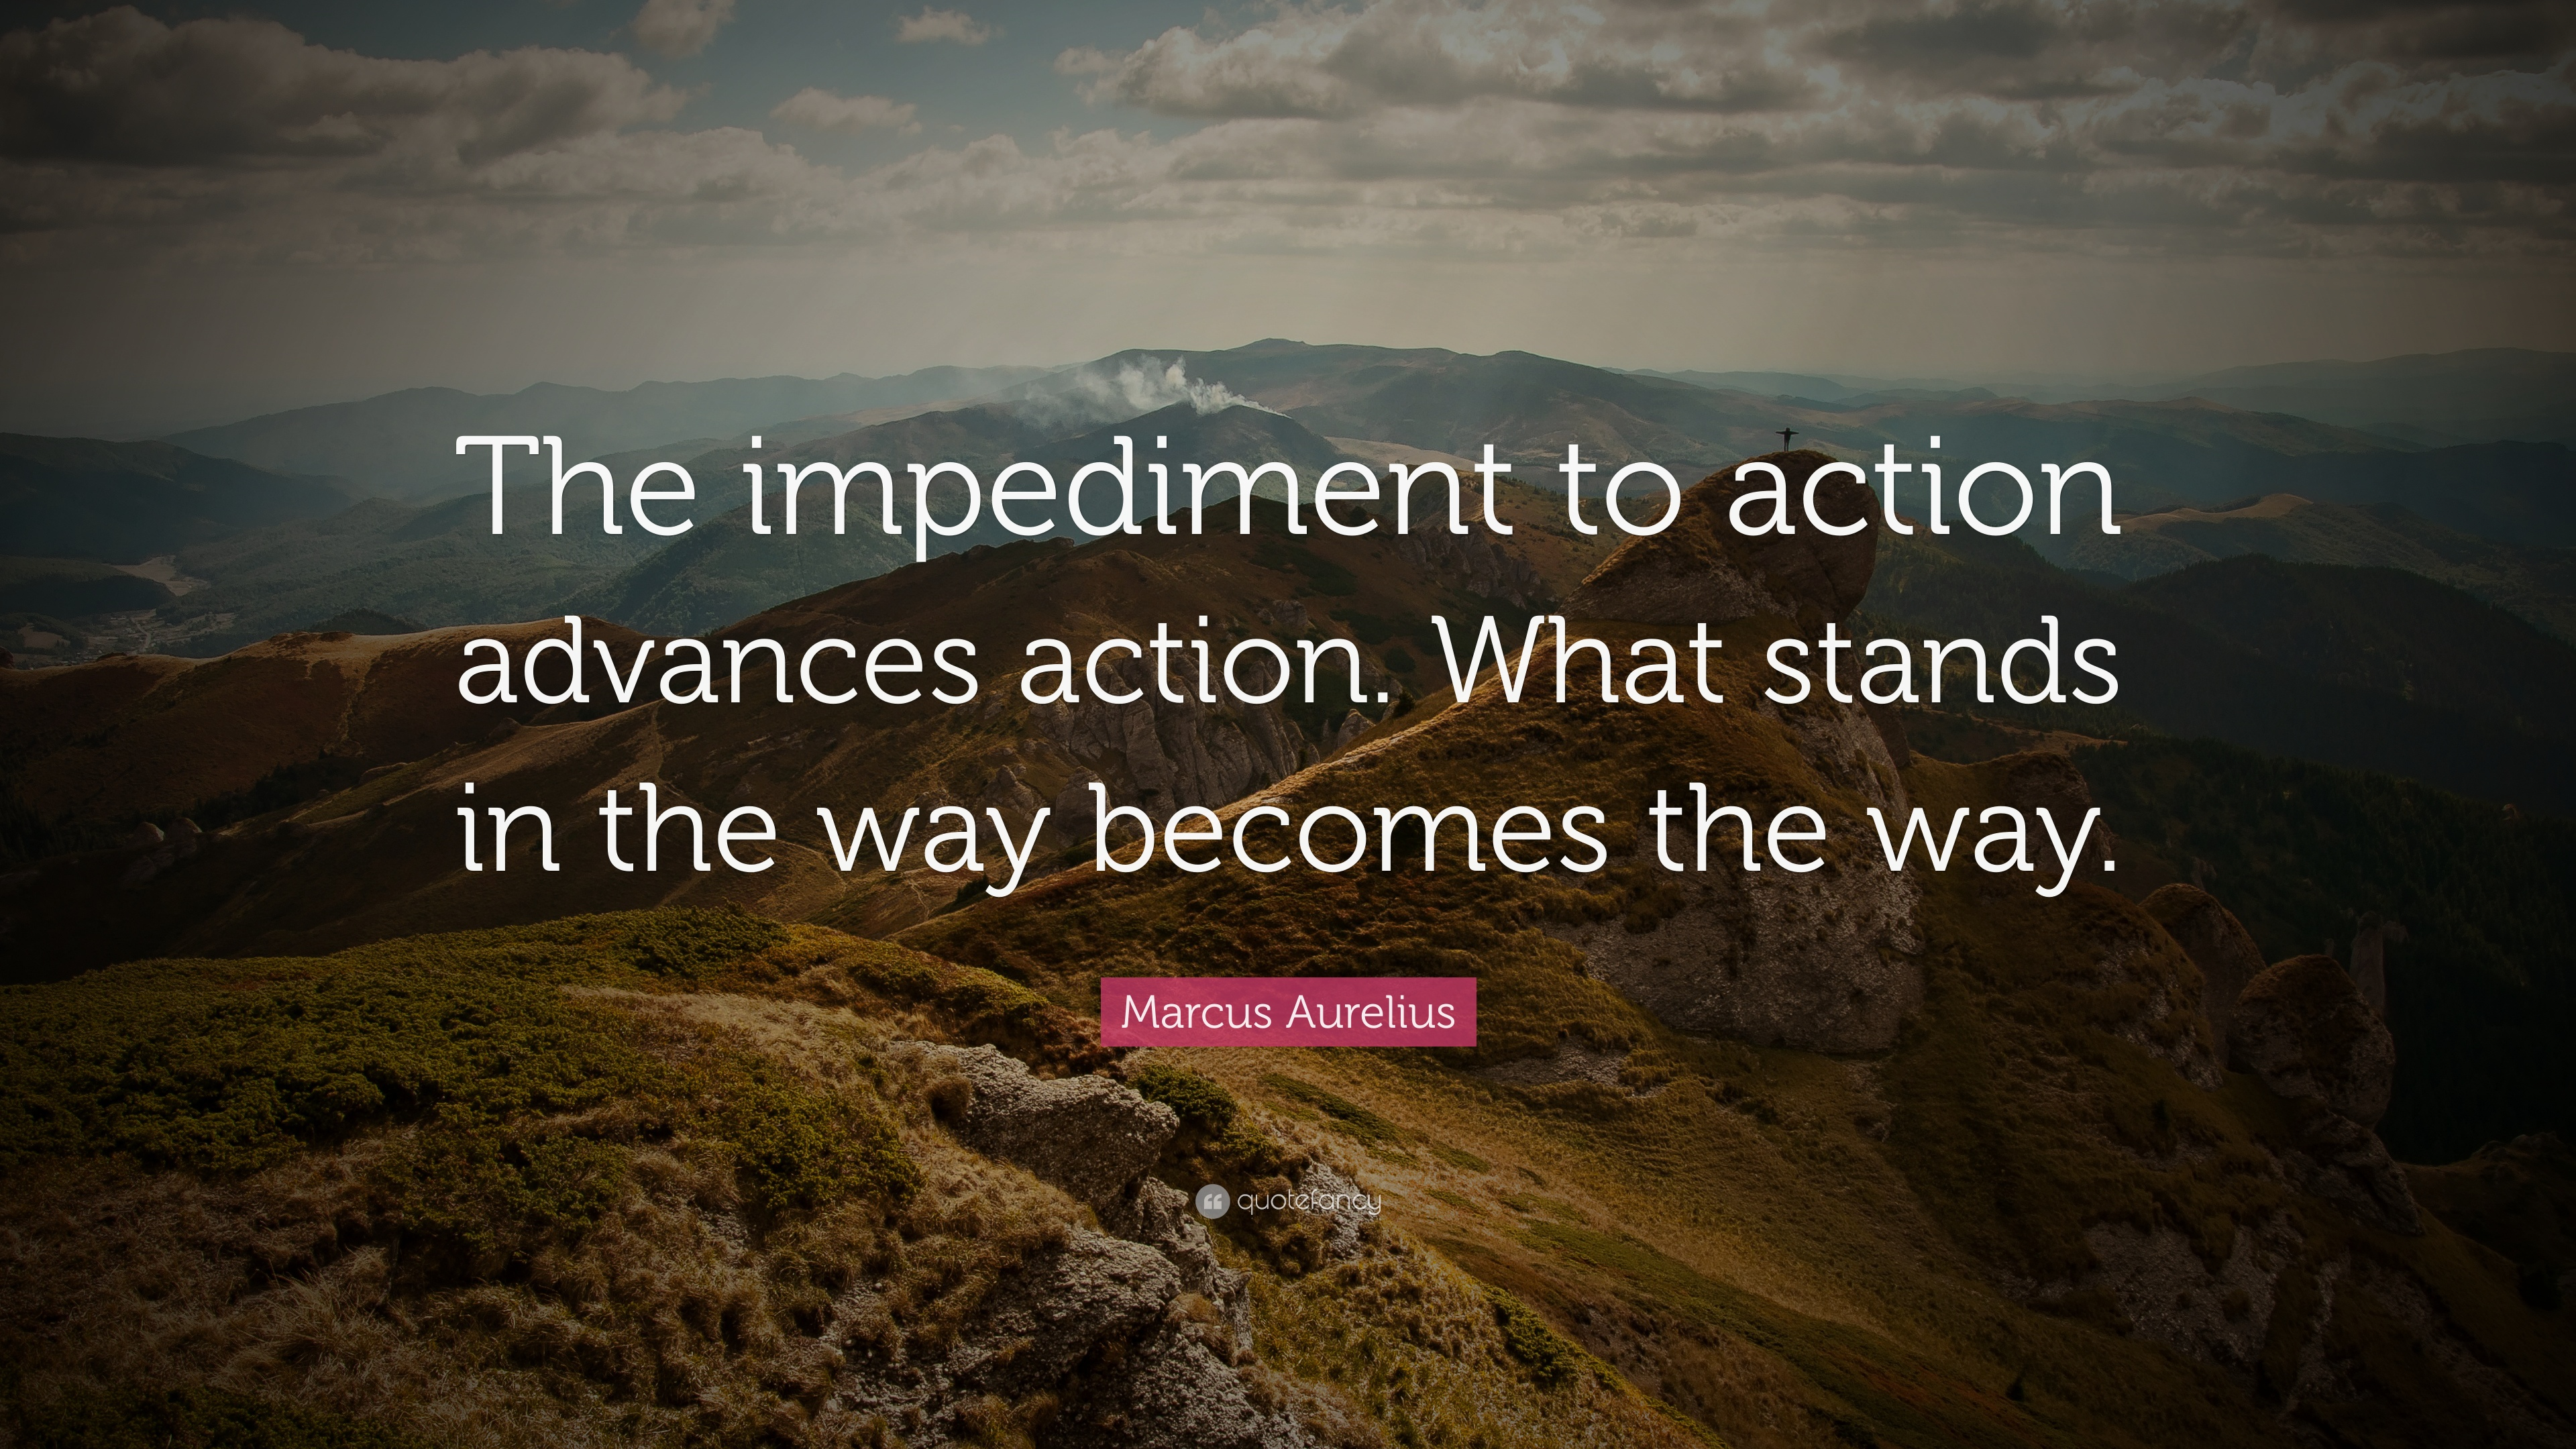 Marcus Aurelius Quote The Impediment To Action Advances Action